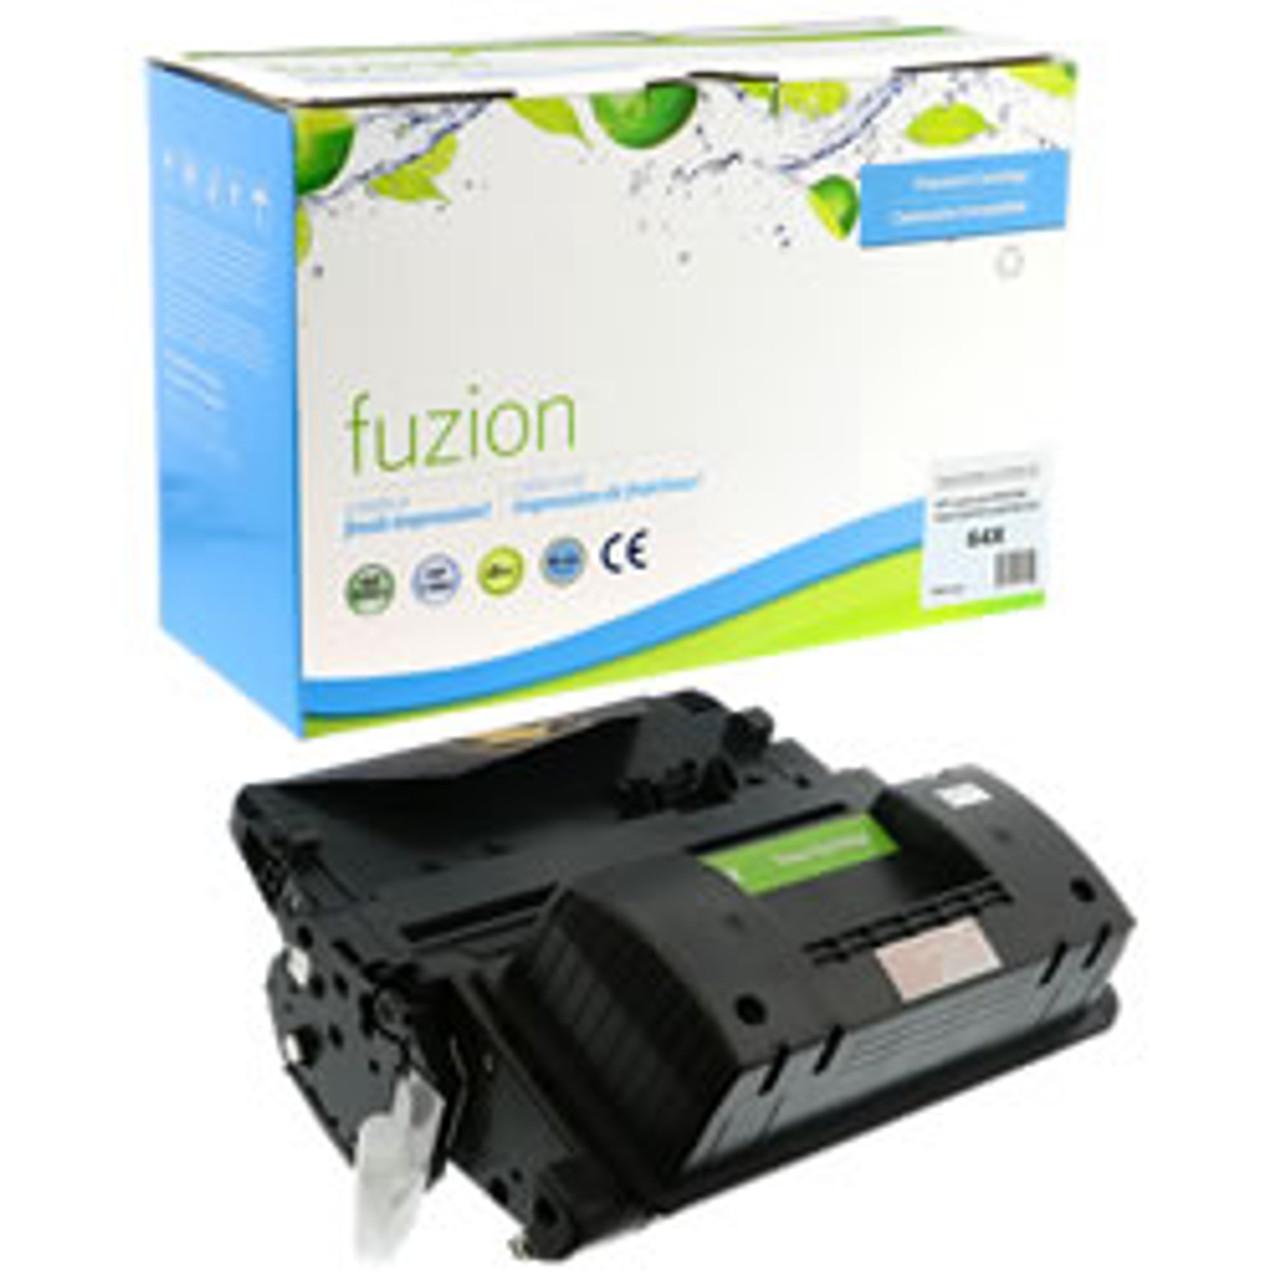 HP Laserjet P4015//P4515 High Yield Black Laser Toner Cartridge CC364X